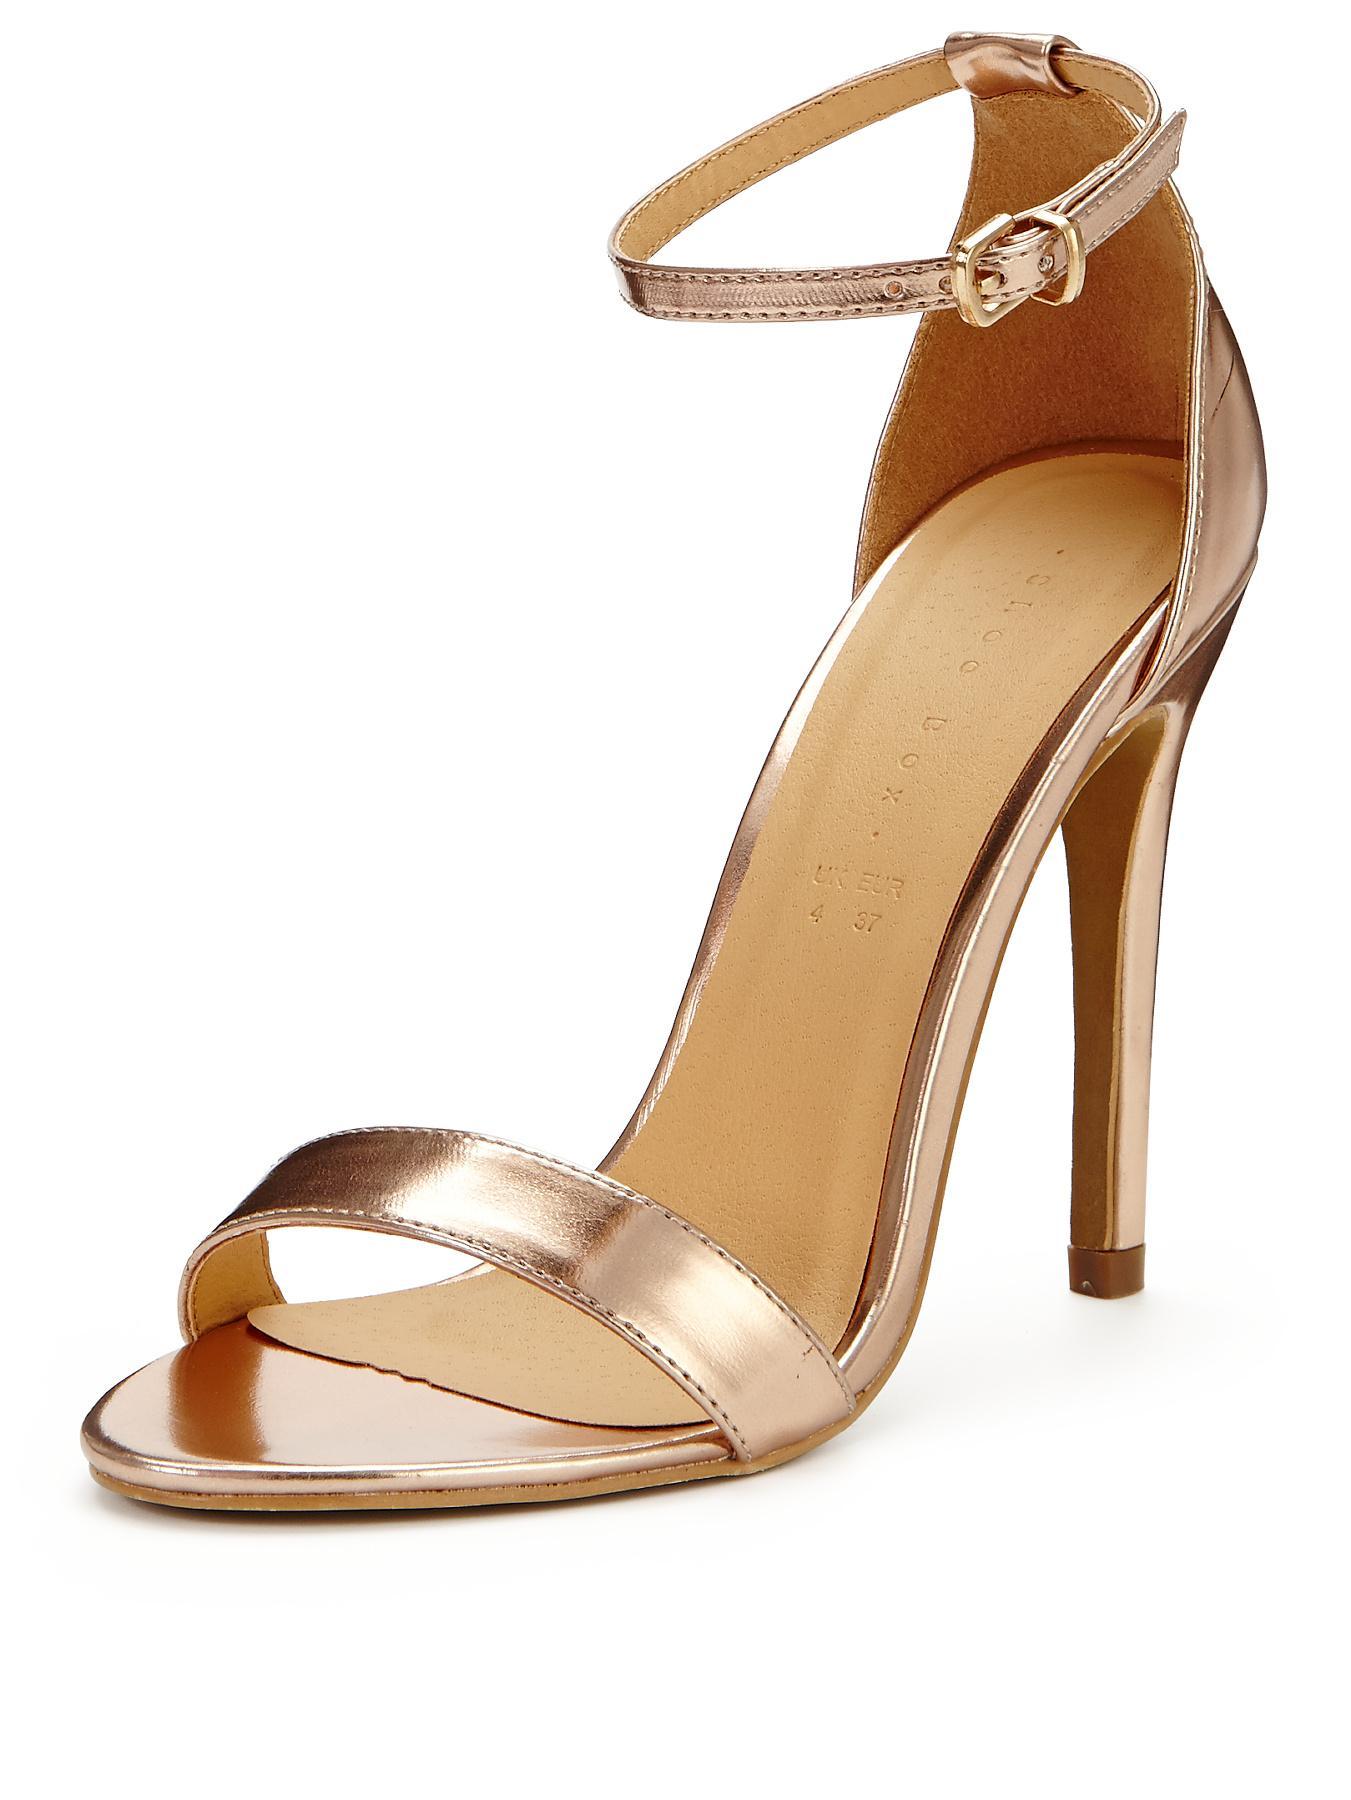 Weding Shoes Sandles 016 - Weding Shoes Sandles